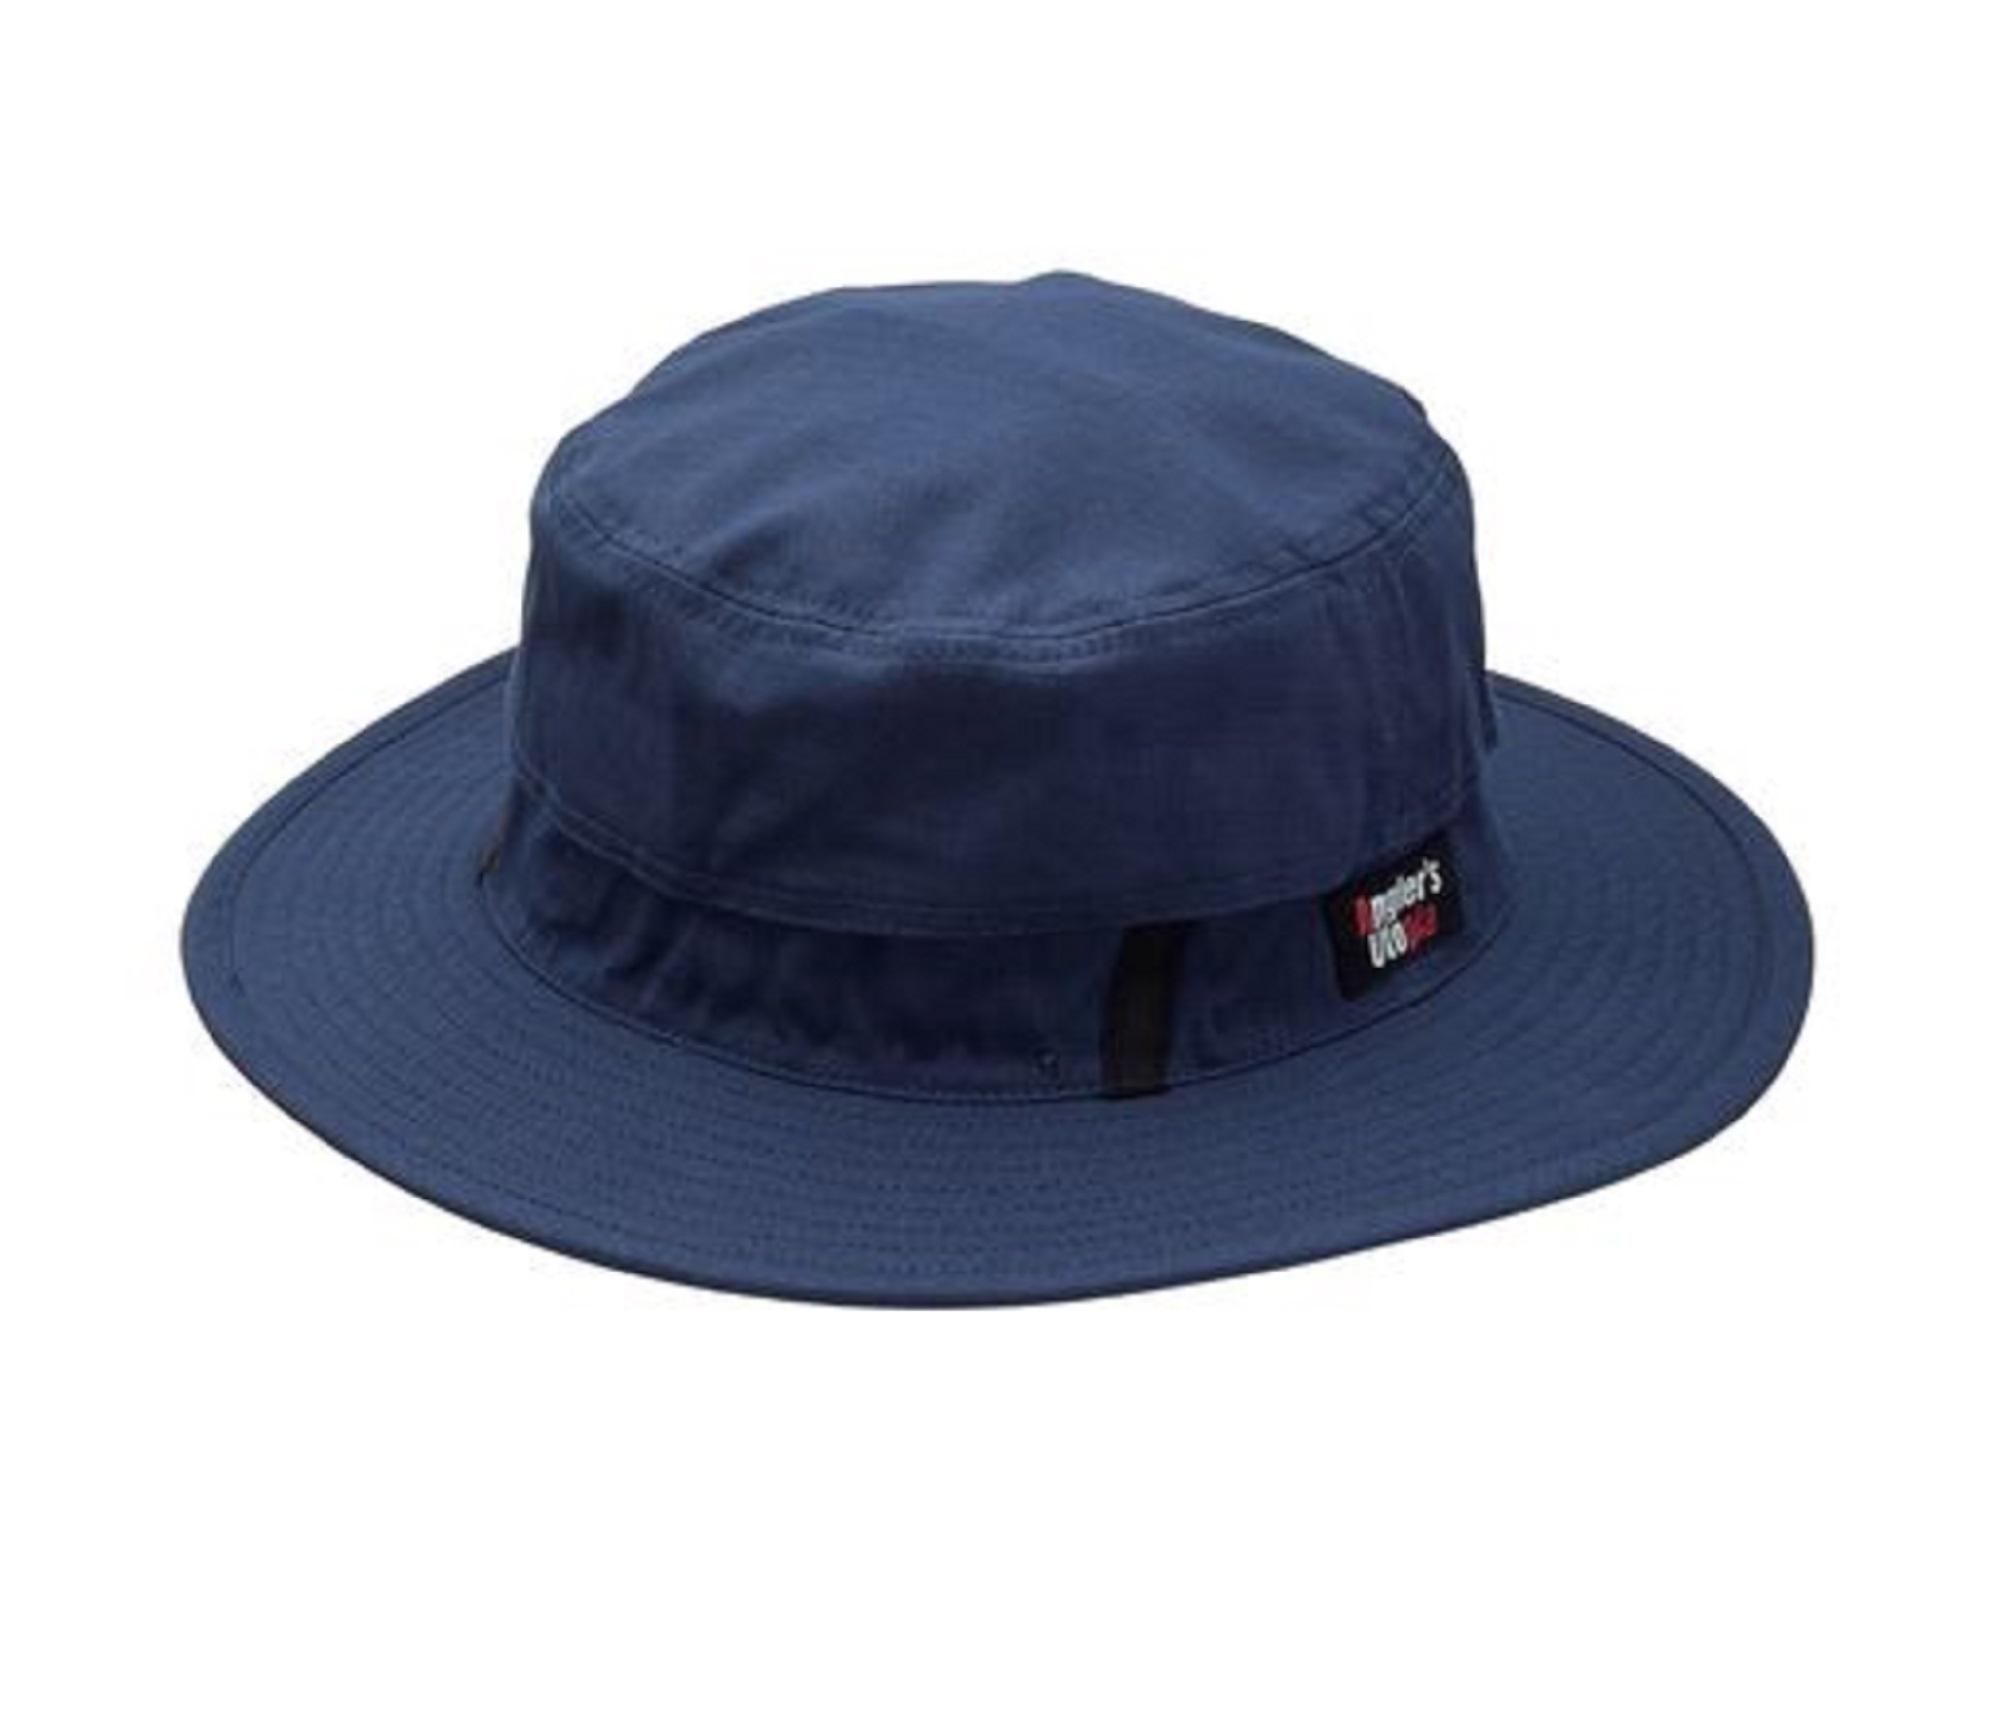 Apia Hat Adventure Free Size Navy (0733)